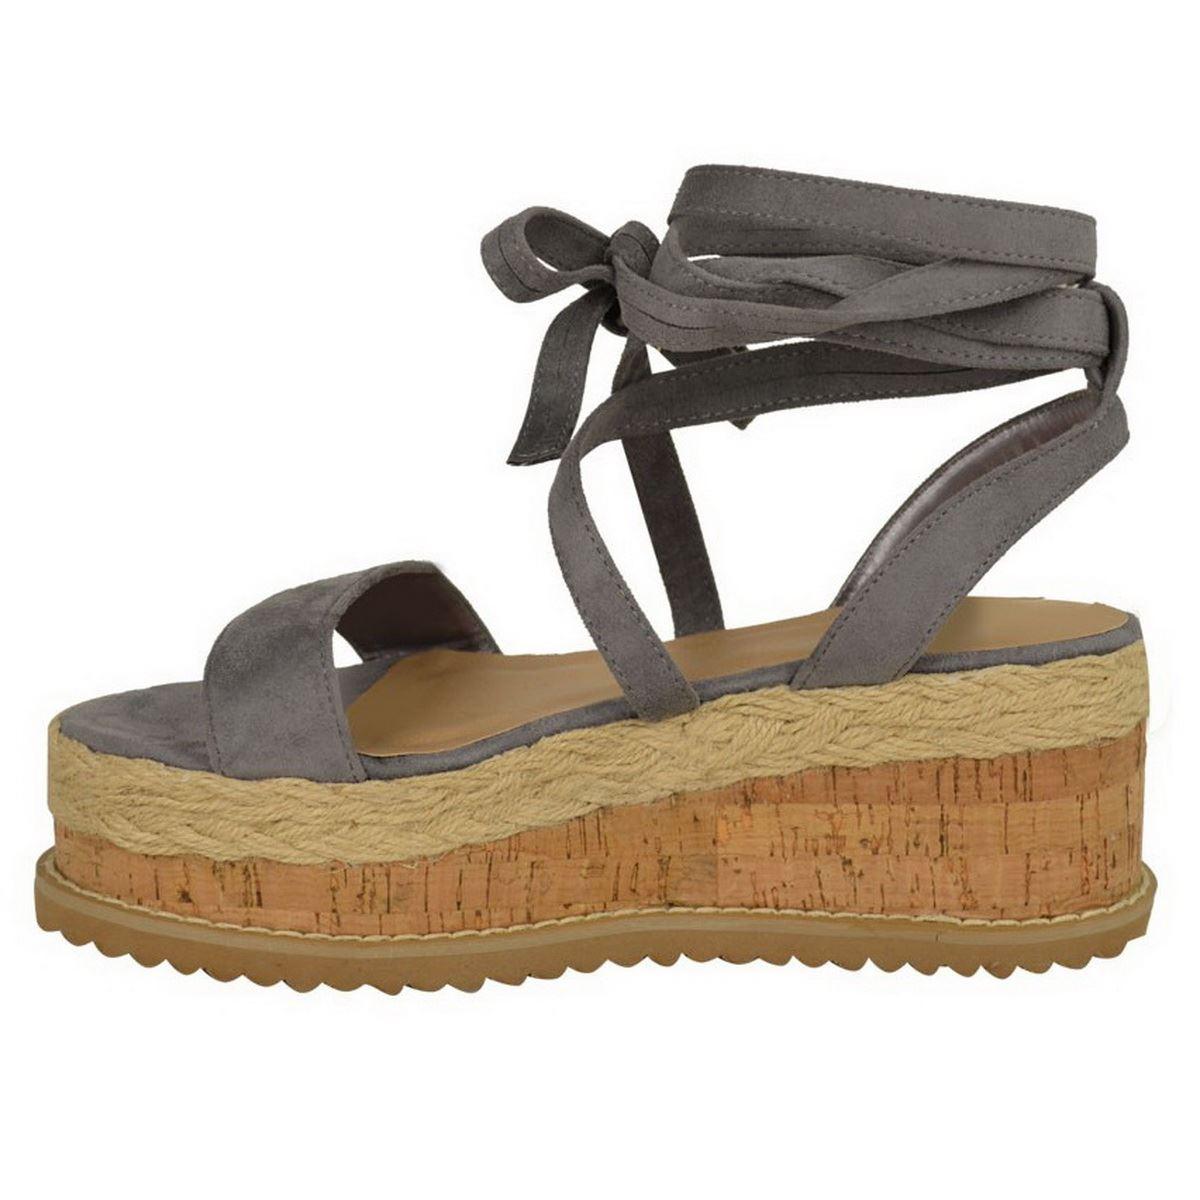 Womens Ladies Flat Wedge Platform Espadrille Sandals Lace Tie Up Summer Shoes